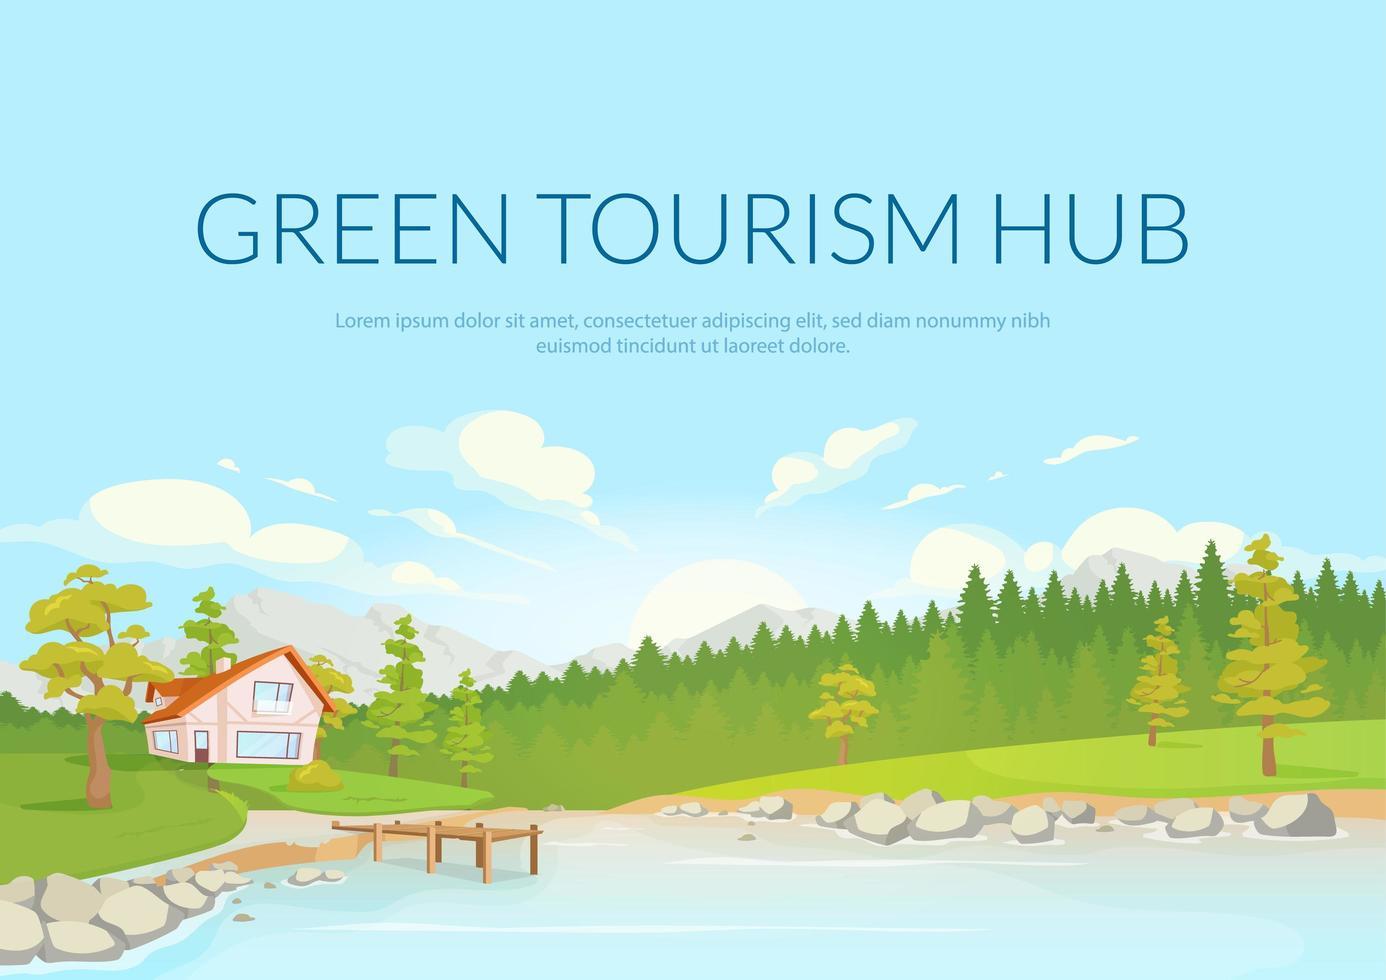 groene toeristische hub poster vector